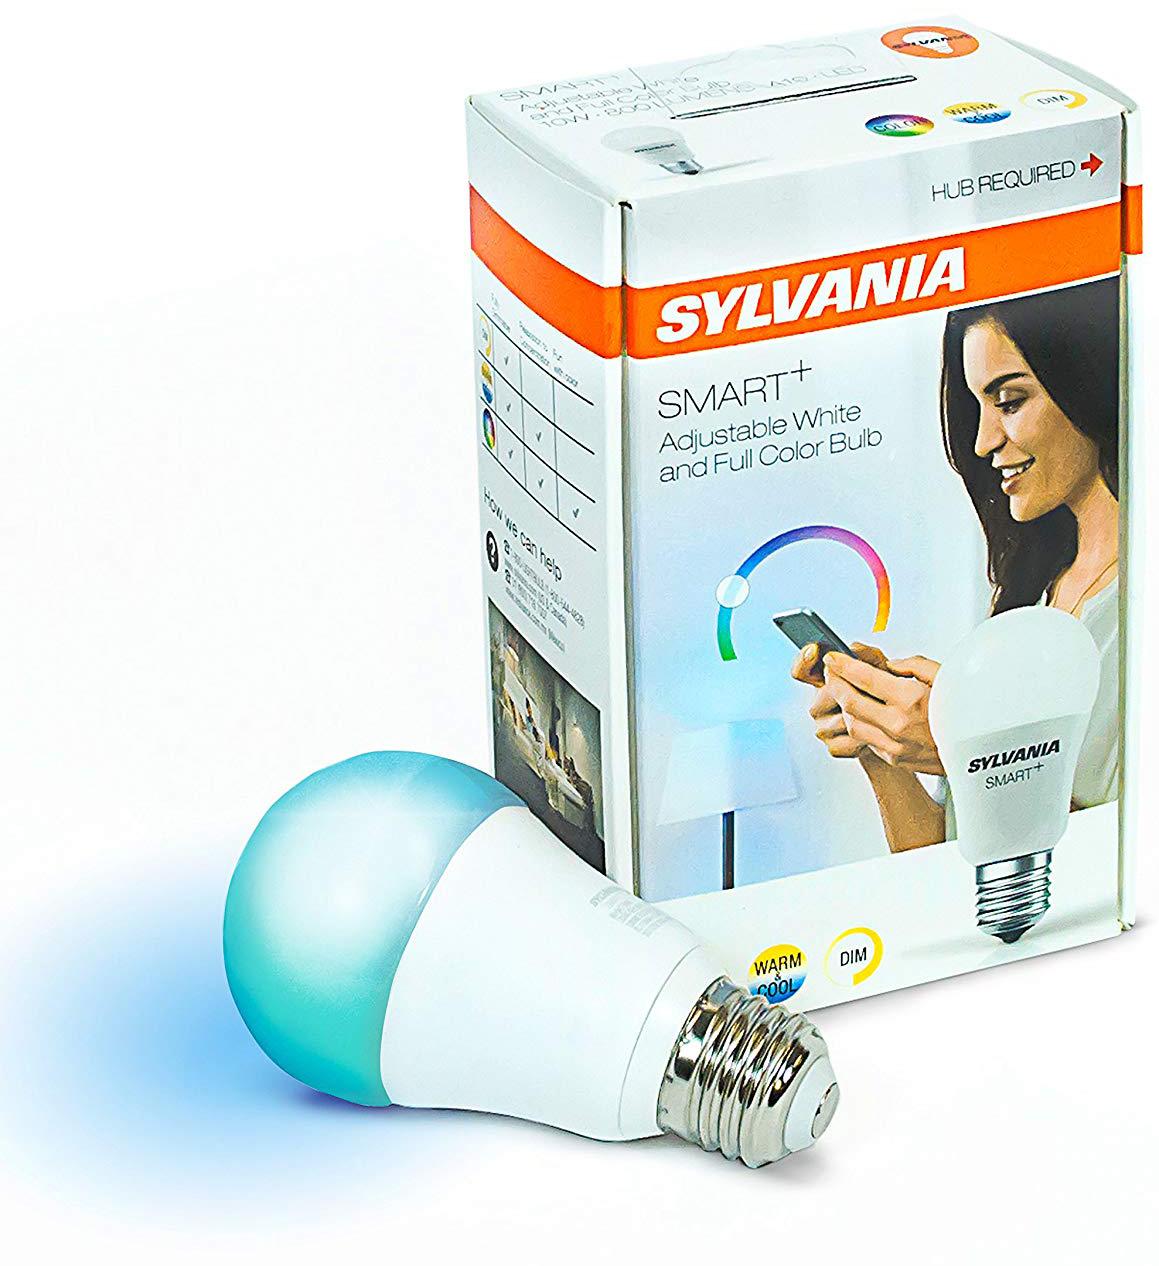 sylvania-smart-bulb-press-01.jpg